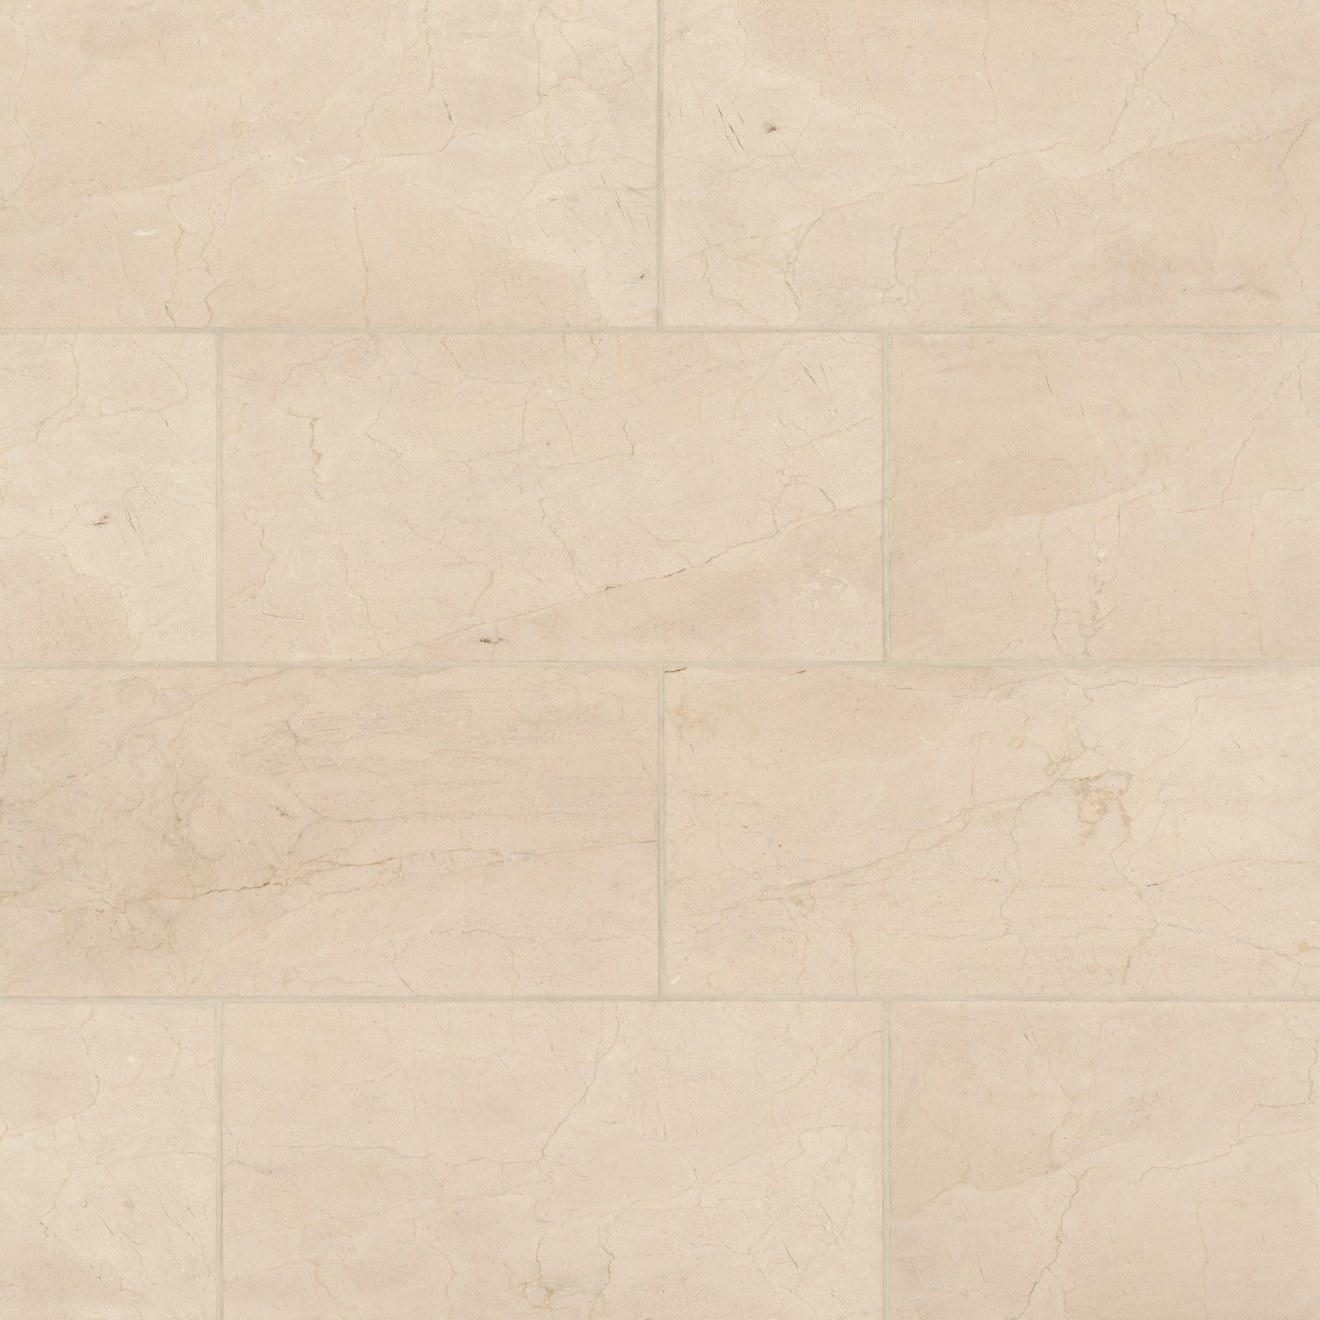 Crema Marfil Select 12 Quot X 24 Quot Floor Amp Wall Tile